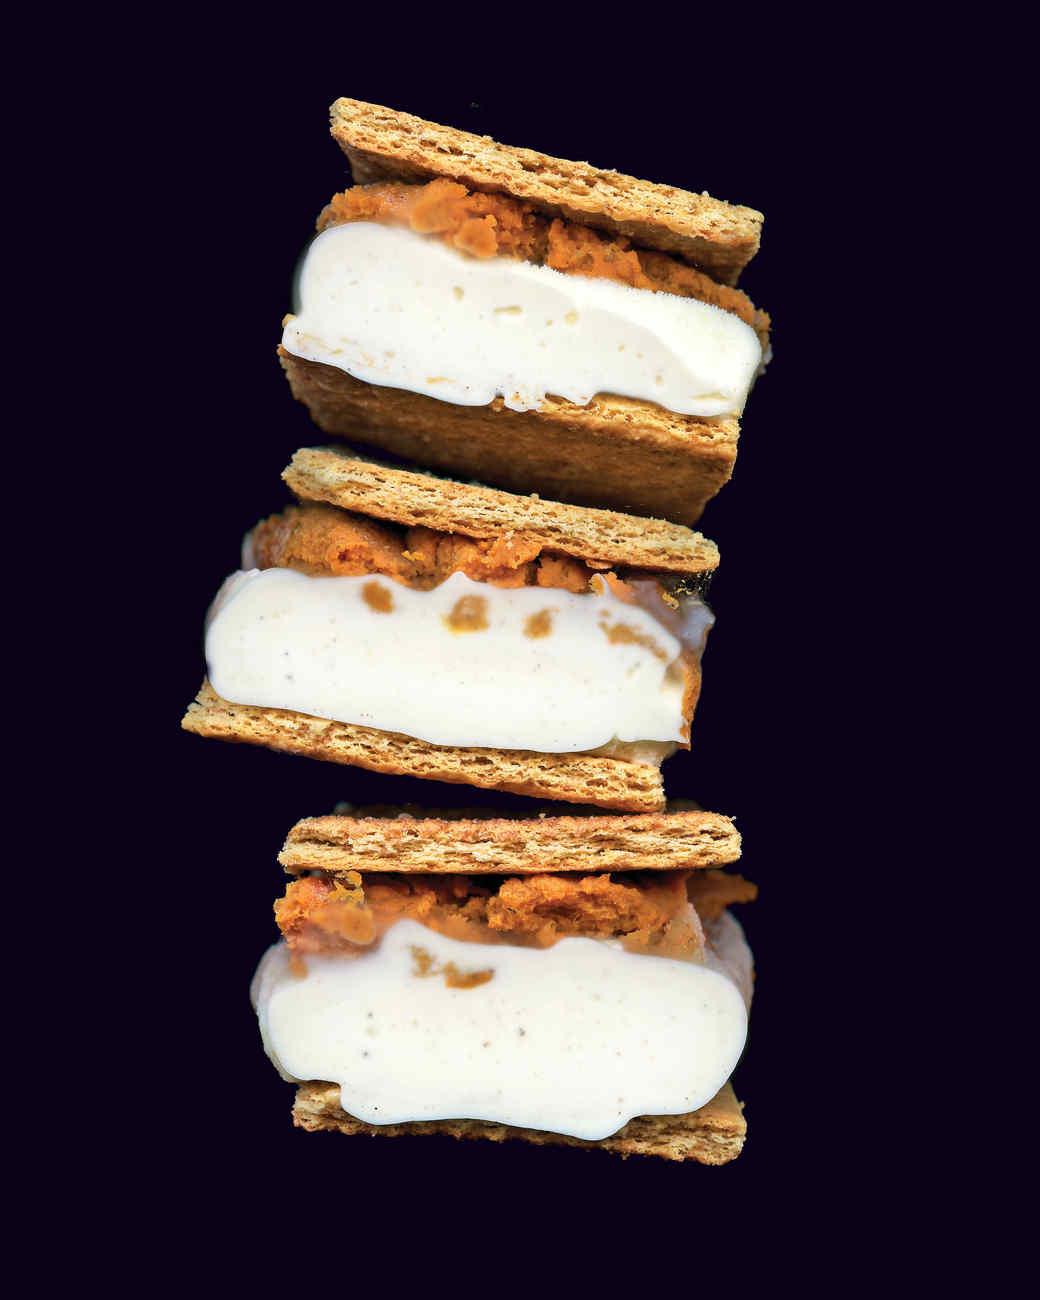 Pumpkin and Ice Cream Sandwich